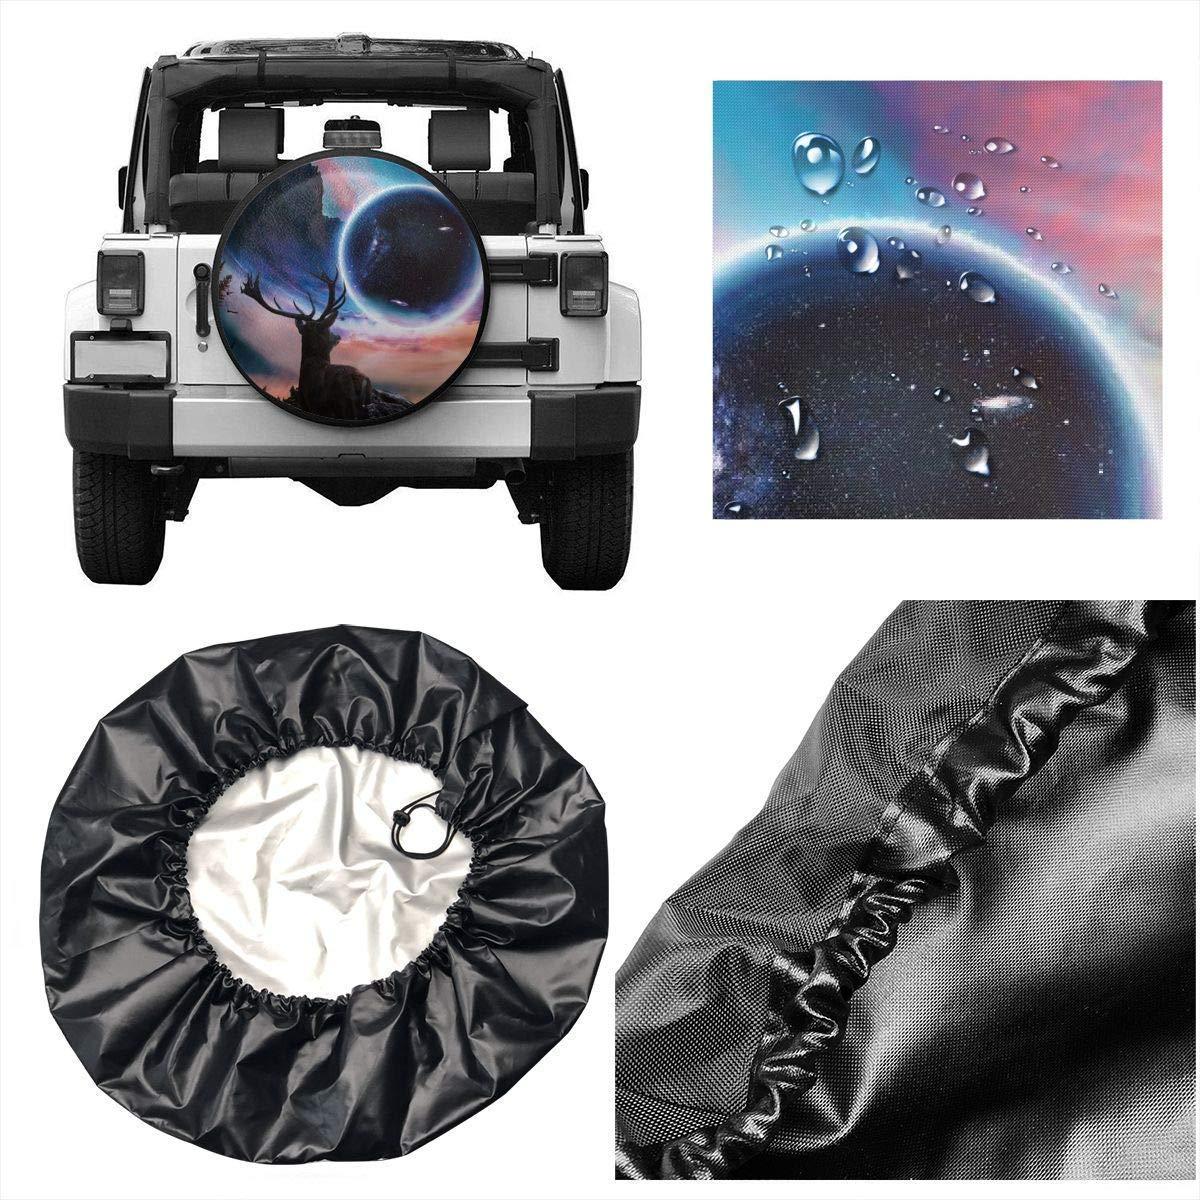 Belleeer Cubierta de Rueda de Repuesto,Deer Fantastic World Potable Polyester Universal Spare Wheel Tire Cover Wheel Covers for Jeep Trailer RV SUV Truck Camper Travel Trailer Accessories